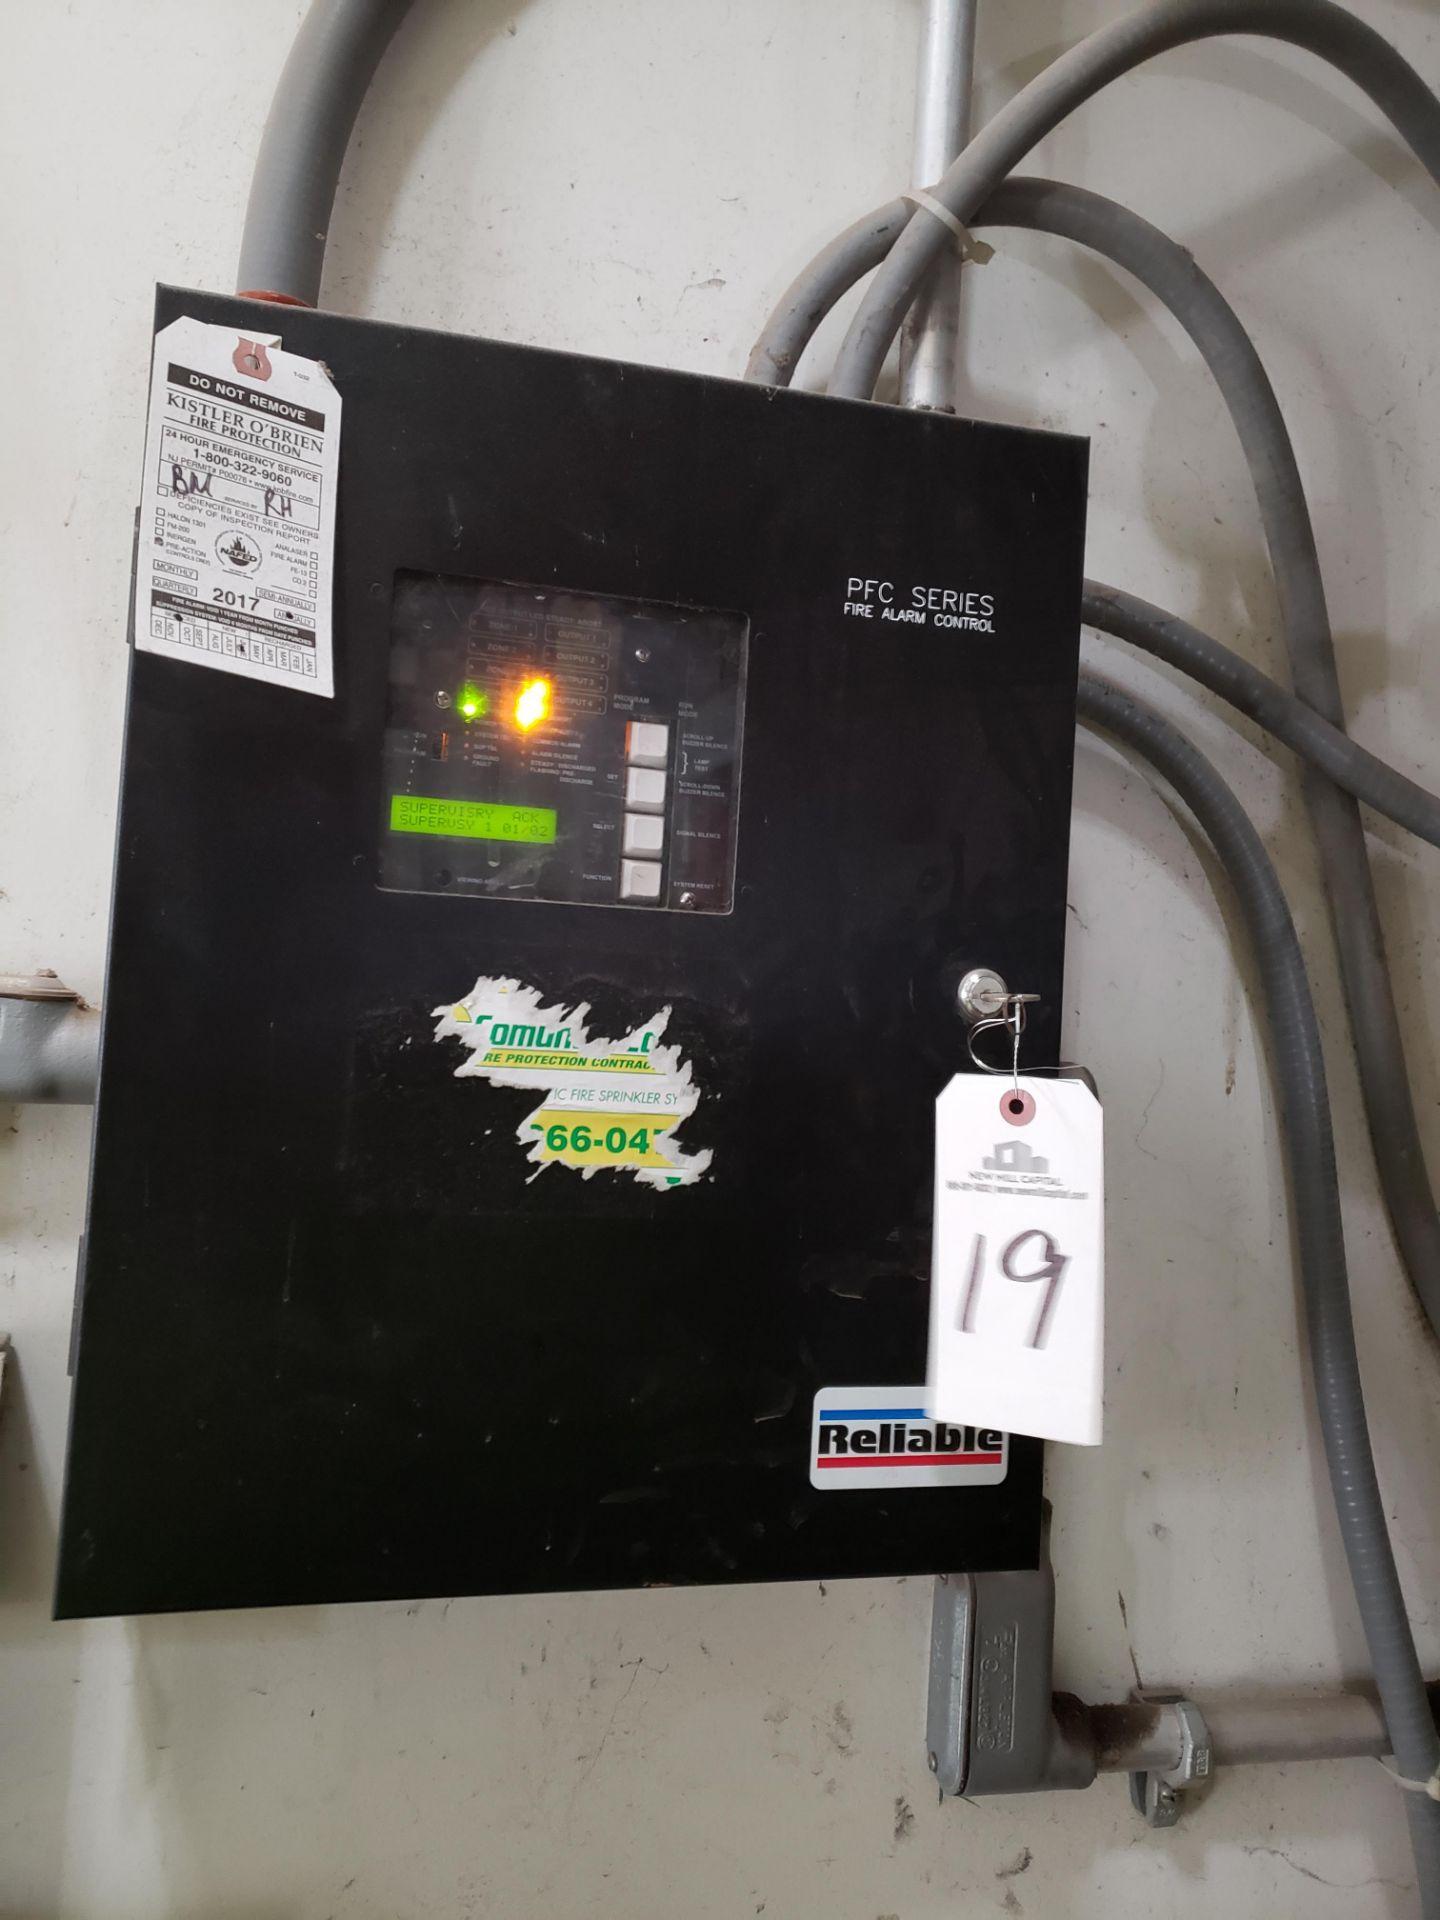 Lot 19 - PFC Series Fire Alarm Controls | Rig Fee: $50